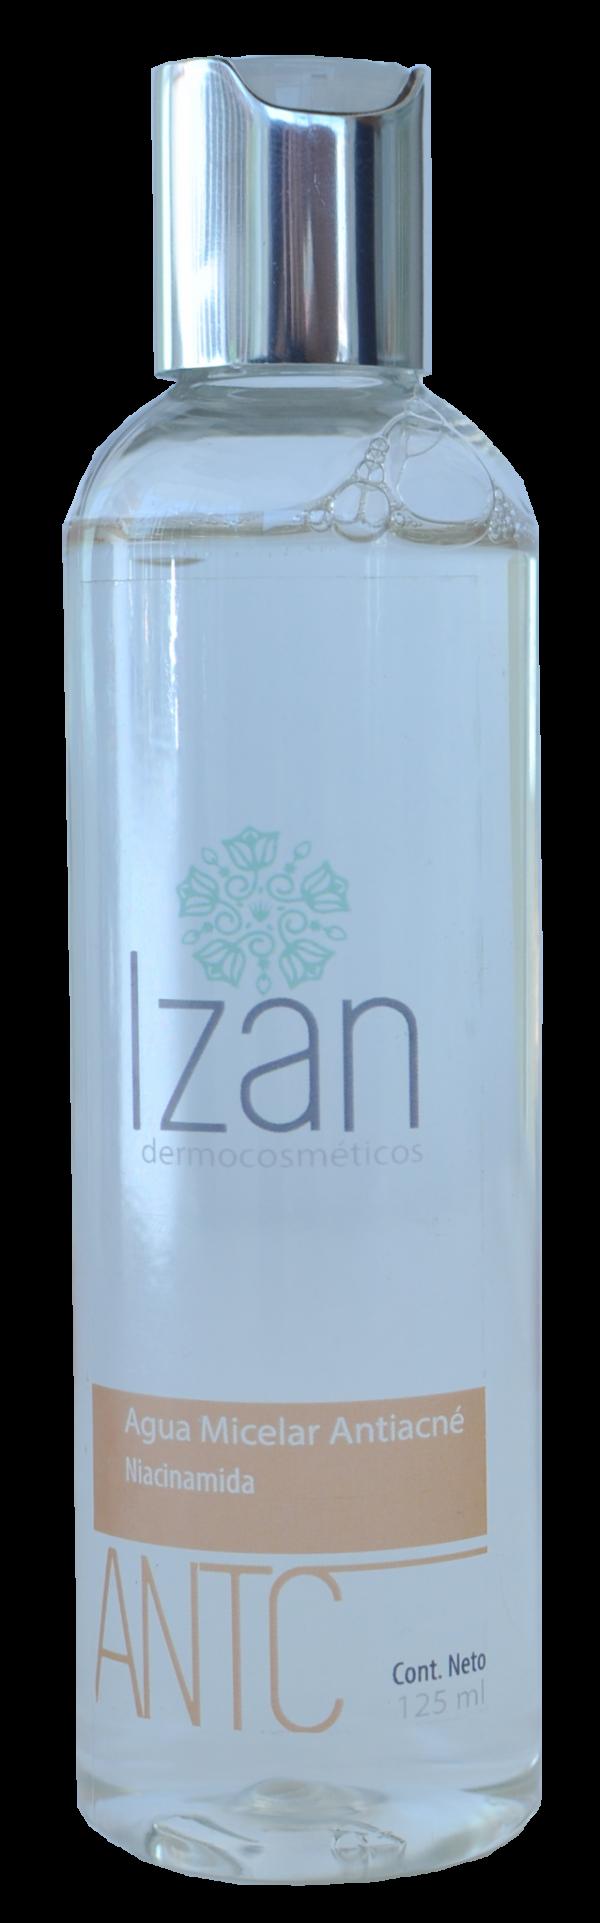 Agua Micelar Antiacné IZAN Dermocosméticos productos